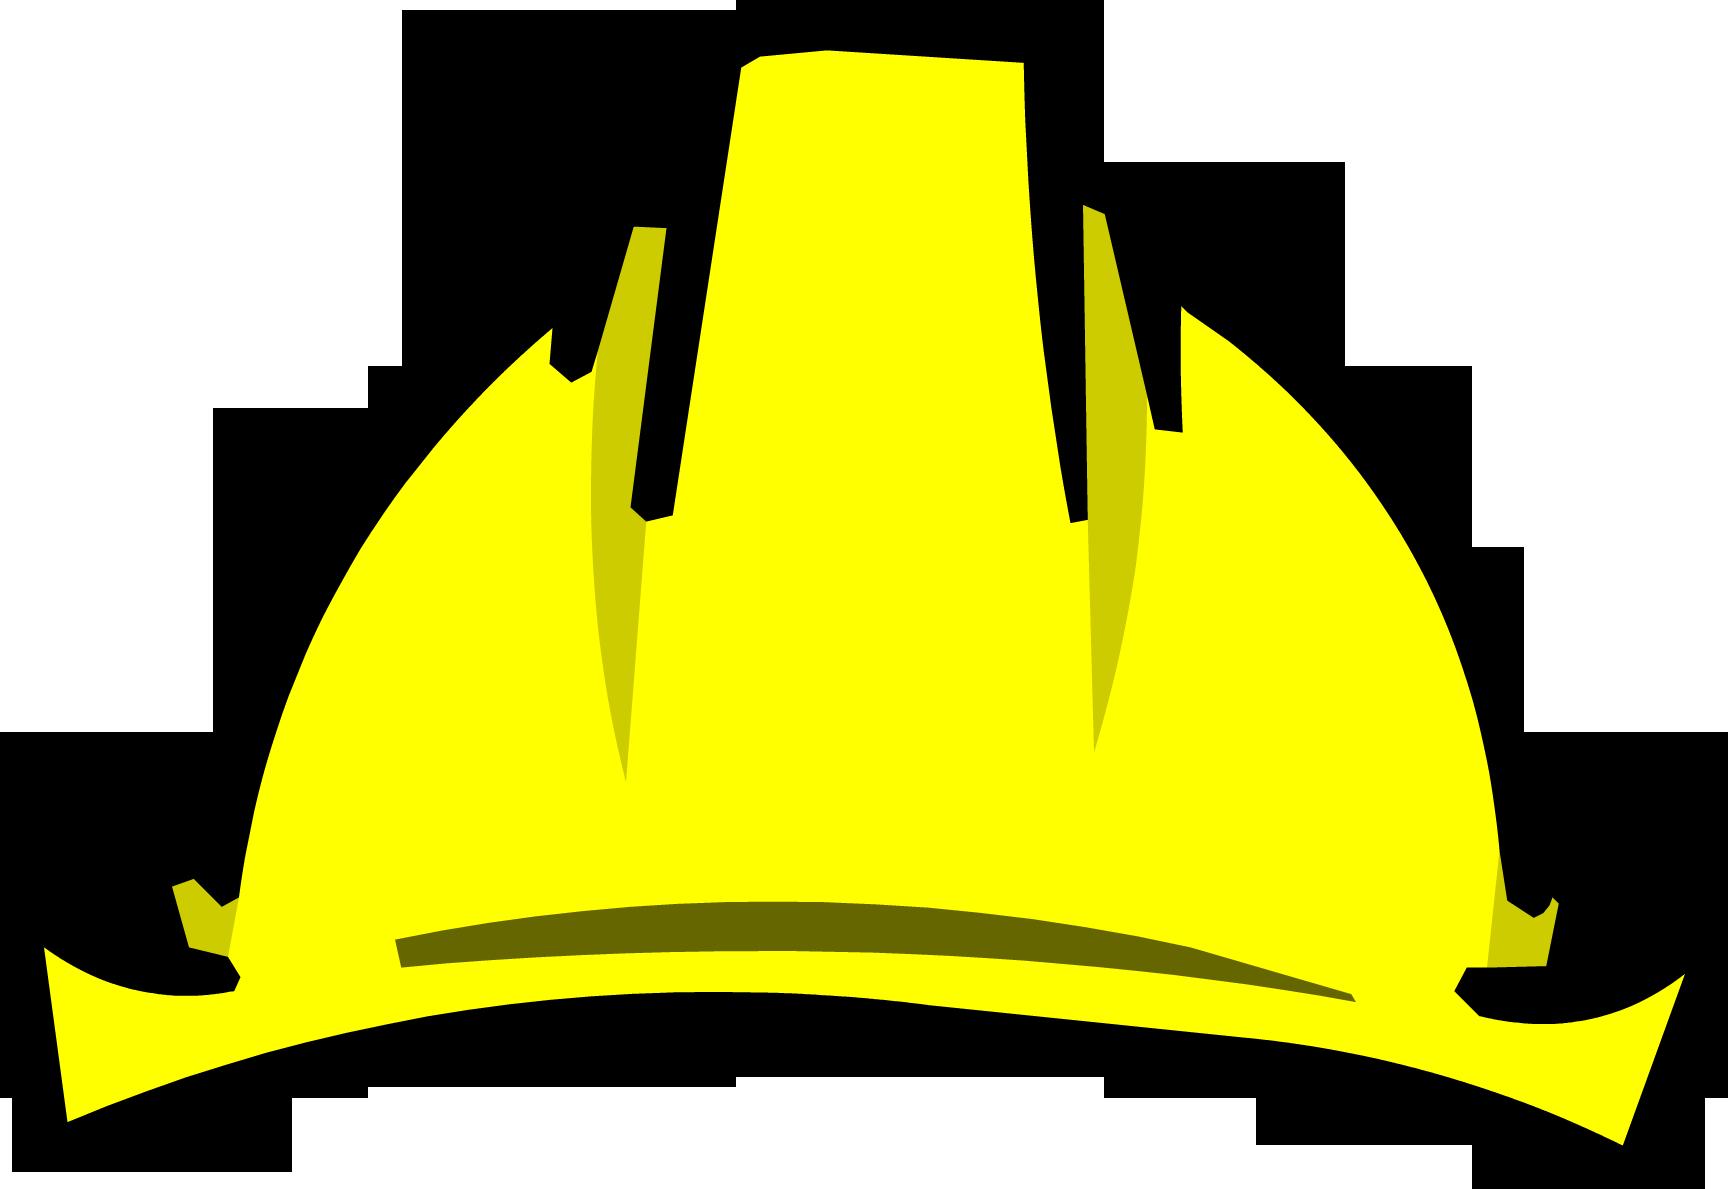 Hard Hat - Club Penguin Wiki - The free, editable encyclopedia